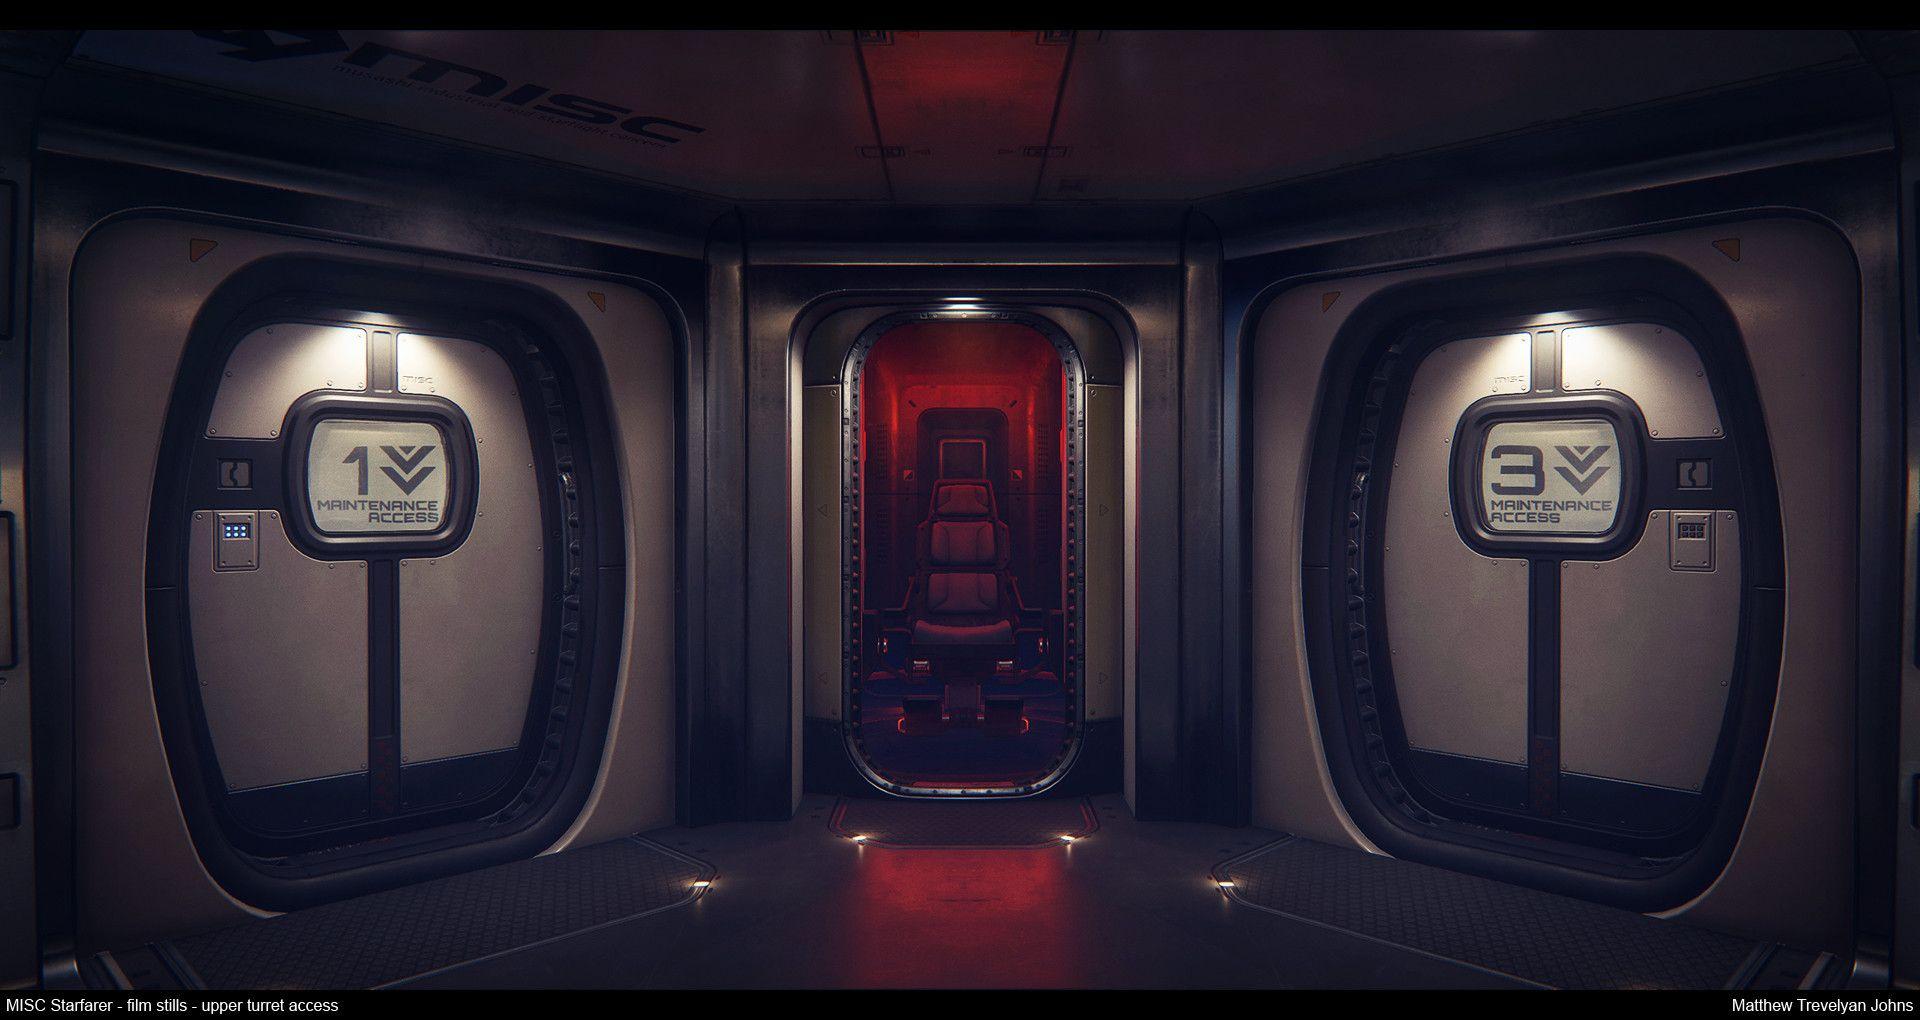 ArtStation - Star Citizen...The Starfarer: Interior focus video, Matthew Trevelyan Johns